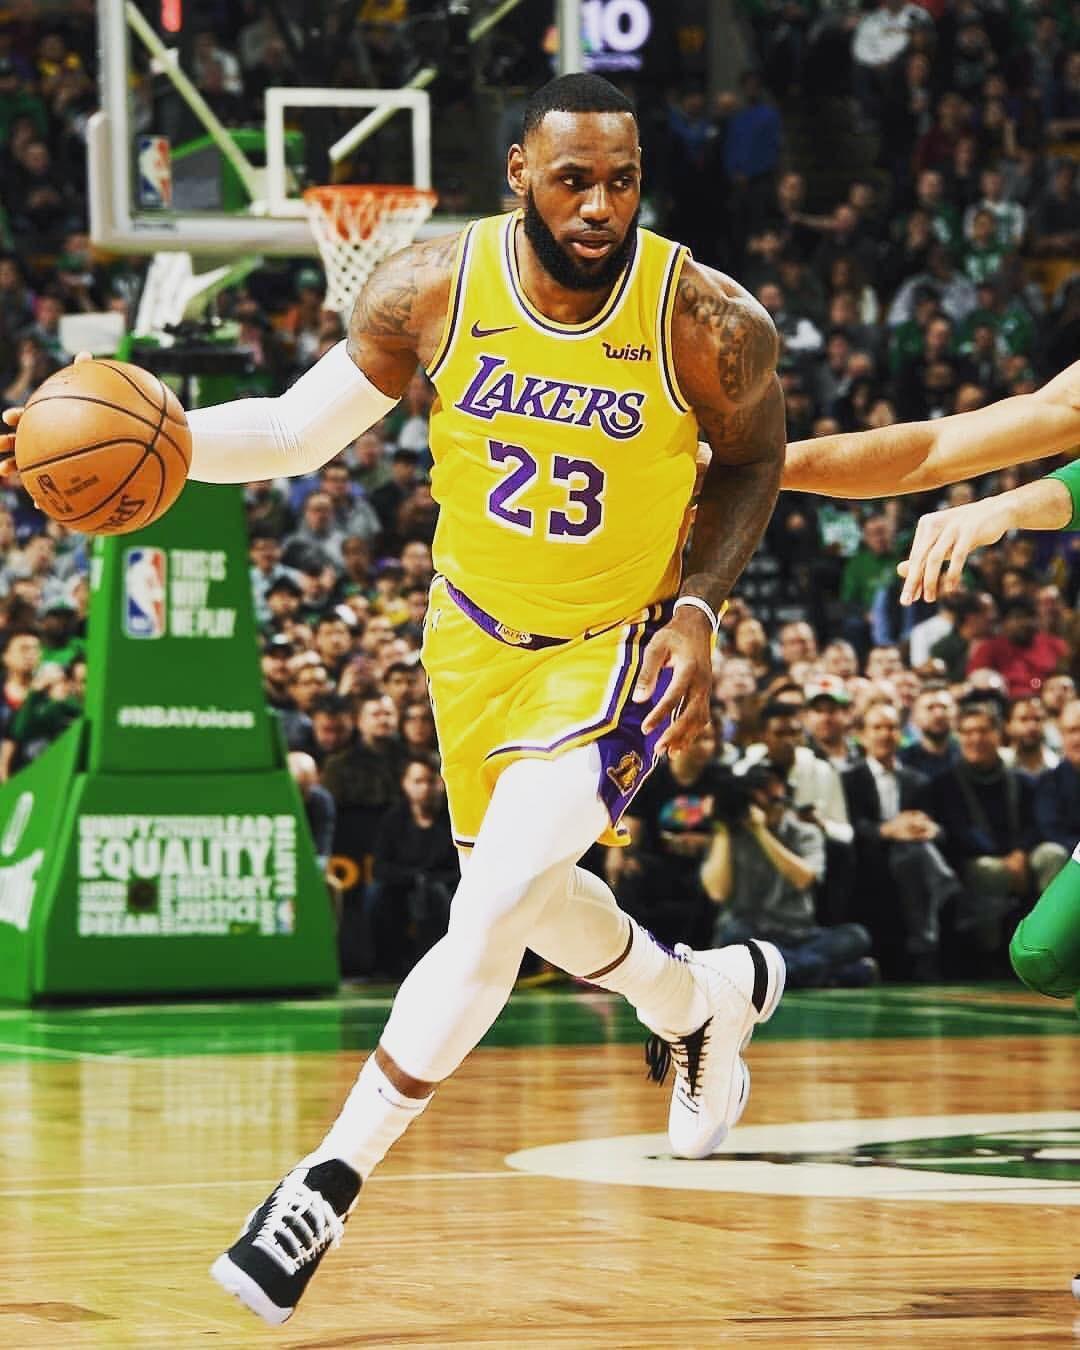 Follow Me Lajamesfans For More About Lebron James Kingjames Lakers Gang Lebron James Lebron James Lakers King Lebron James